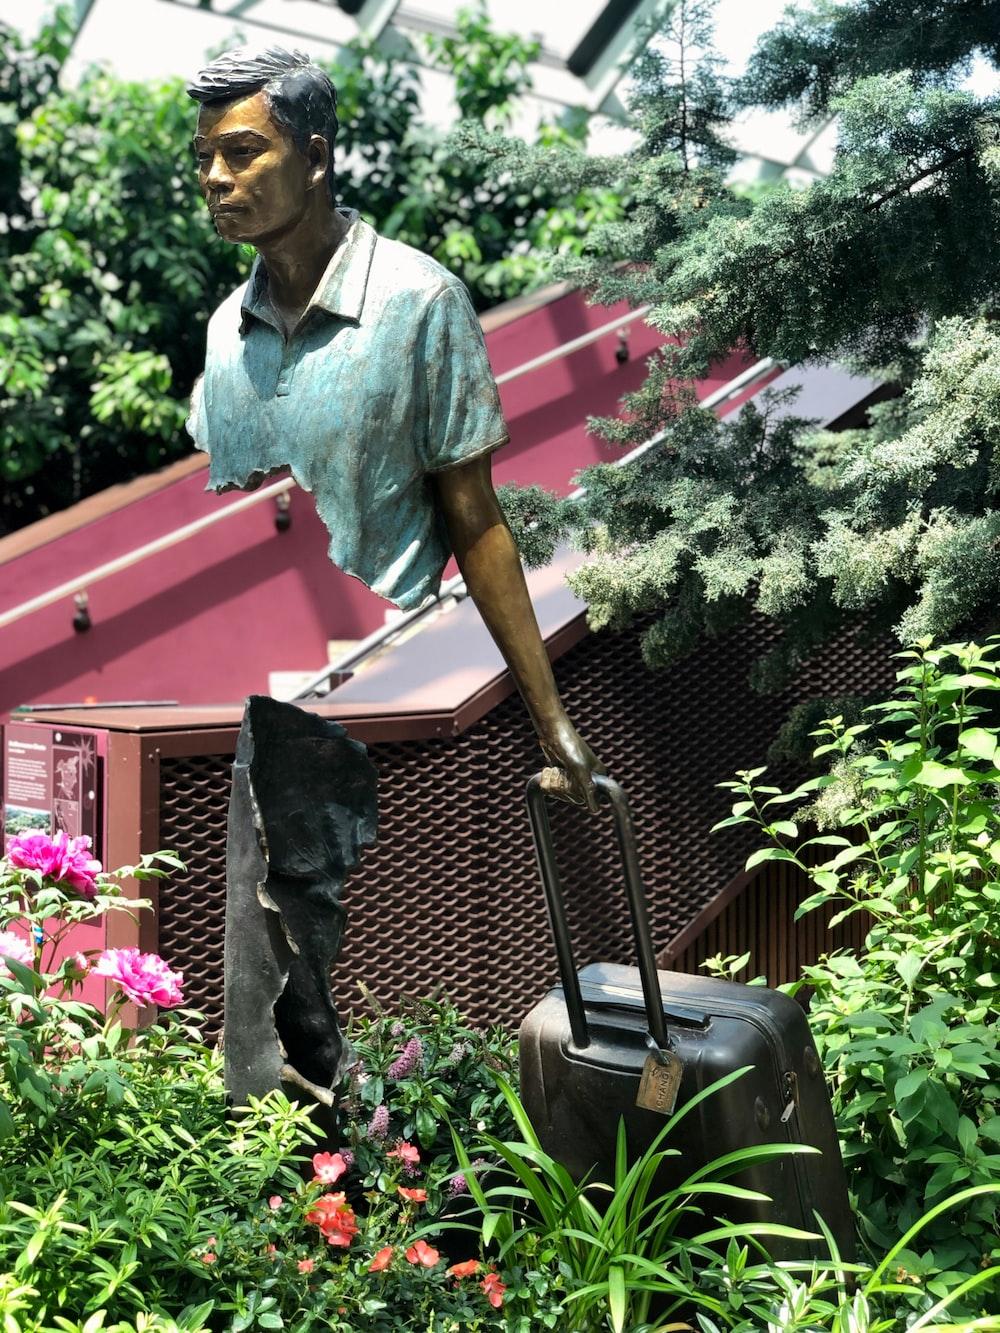 man pulling luggage statue